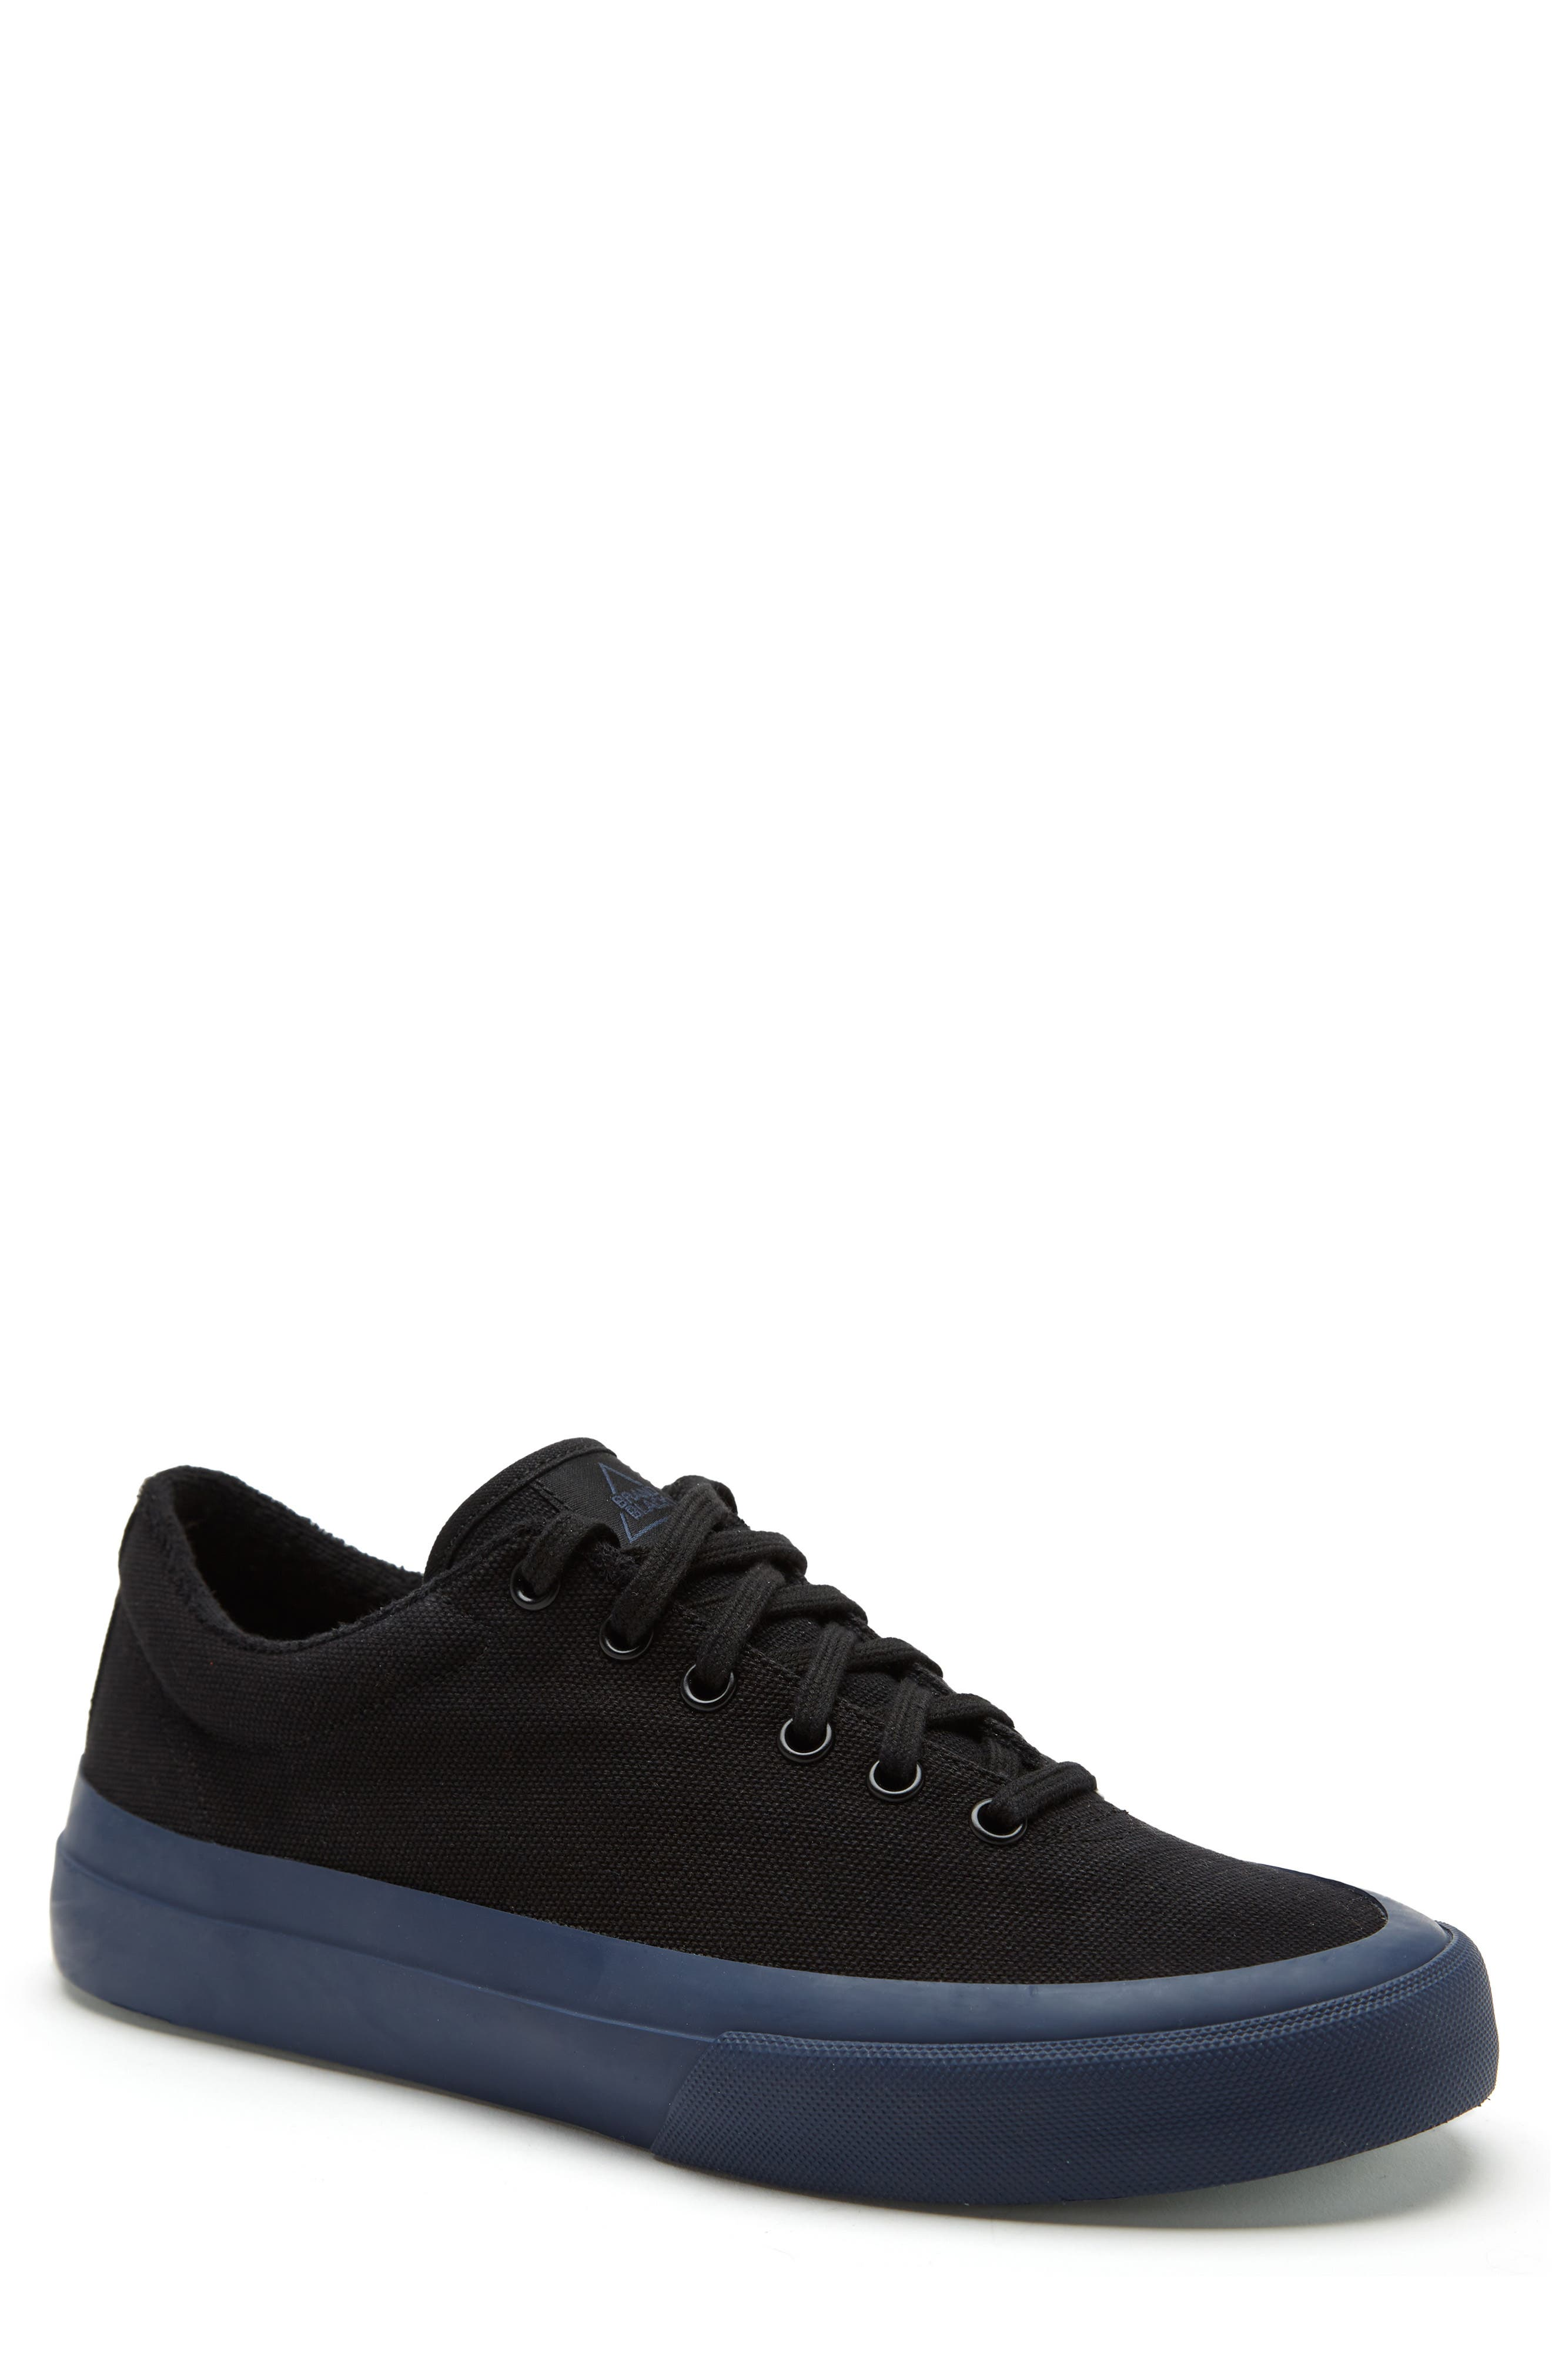 Vesta Low Top Sneaker,                             Main thumbnail 1, color,                             BLACK/ NAVY